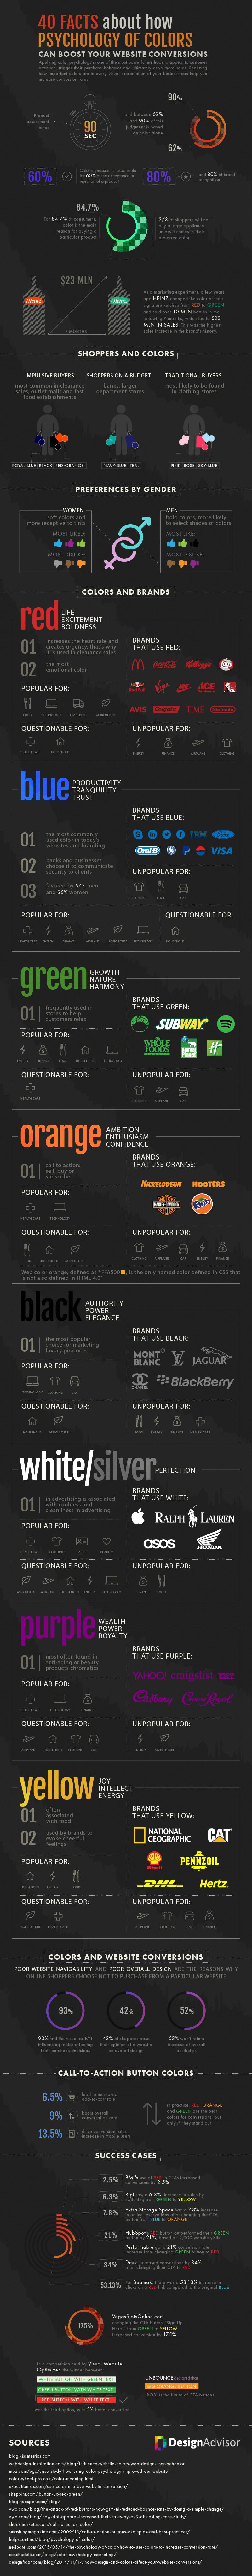 Infographic color | Istomedia web database and multimedia design - σχεδίαση ιστοσελίδων, βάσεις δεδομένων, πολυμέσα